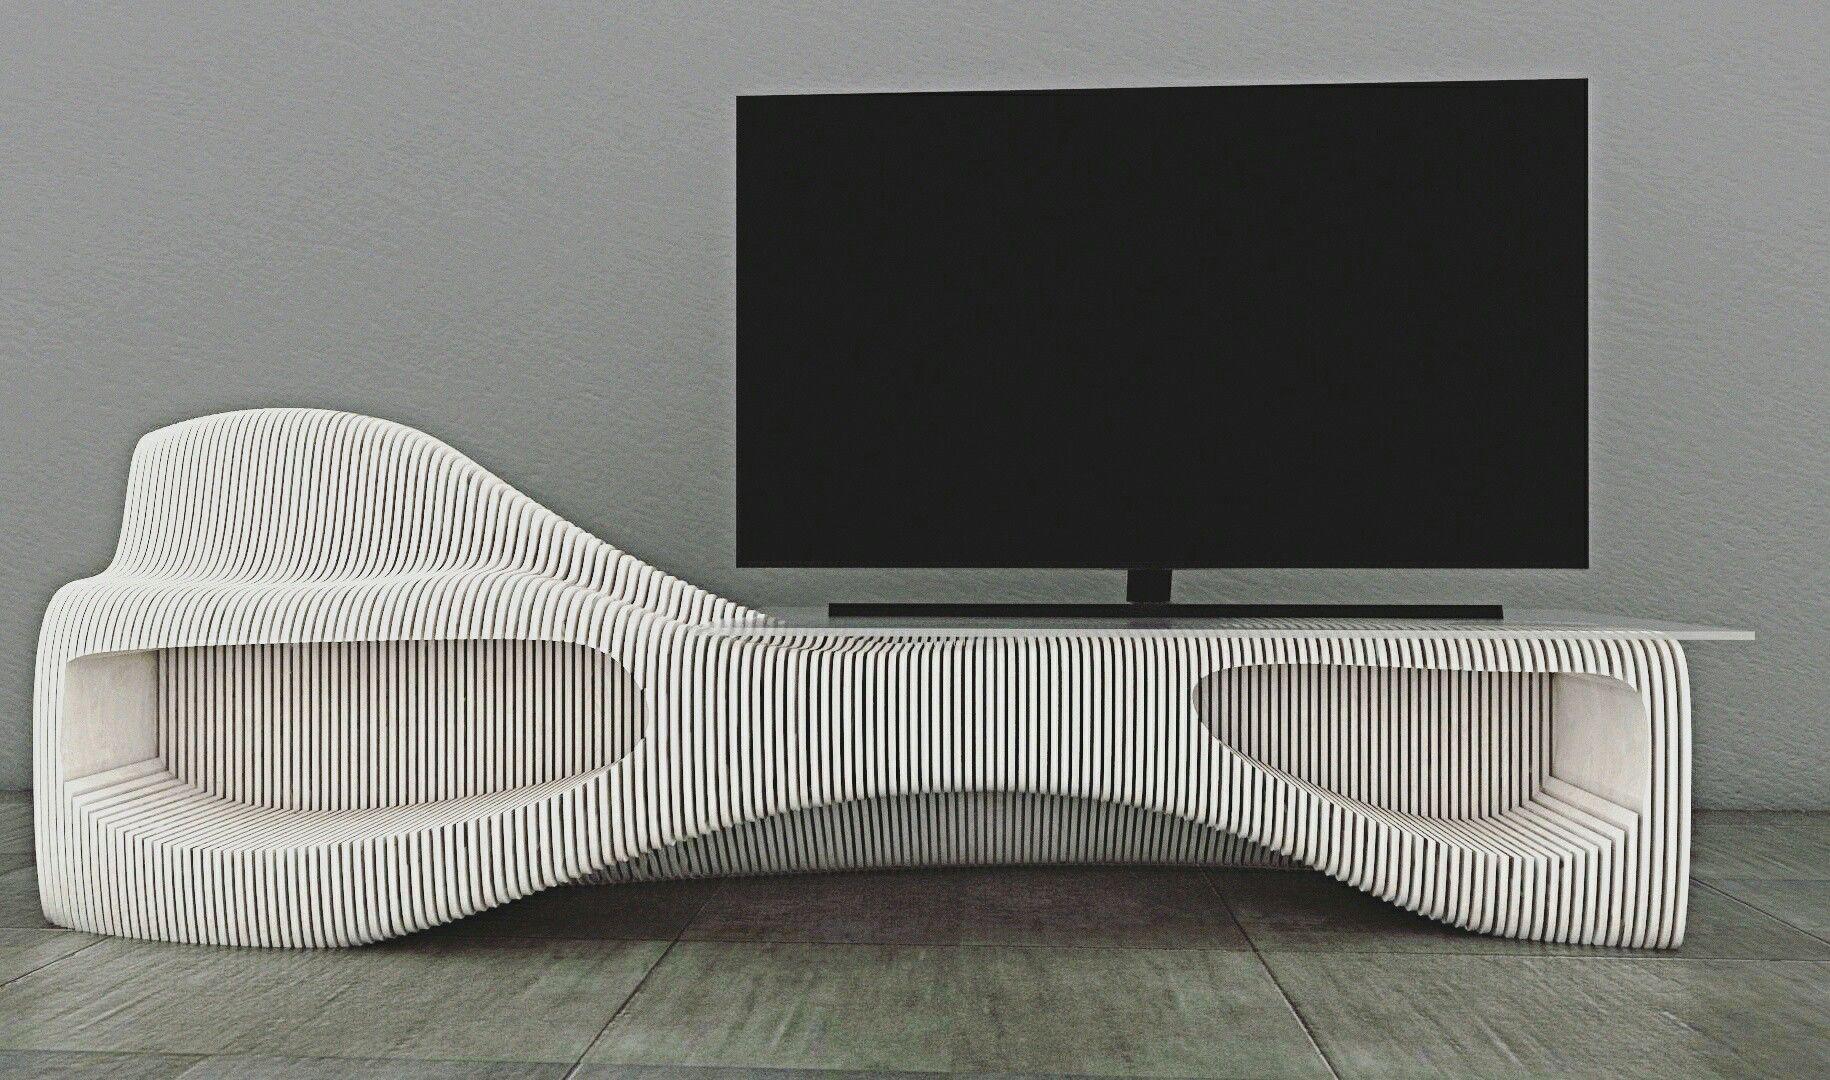 Parametric Furniture Tv Unit Design Using Grashopper